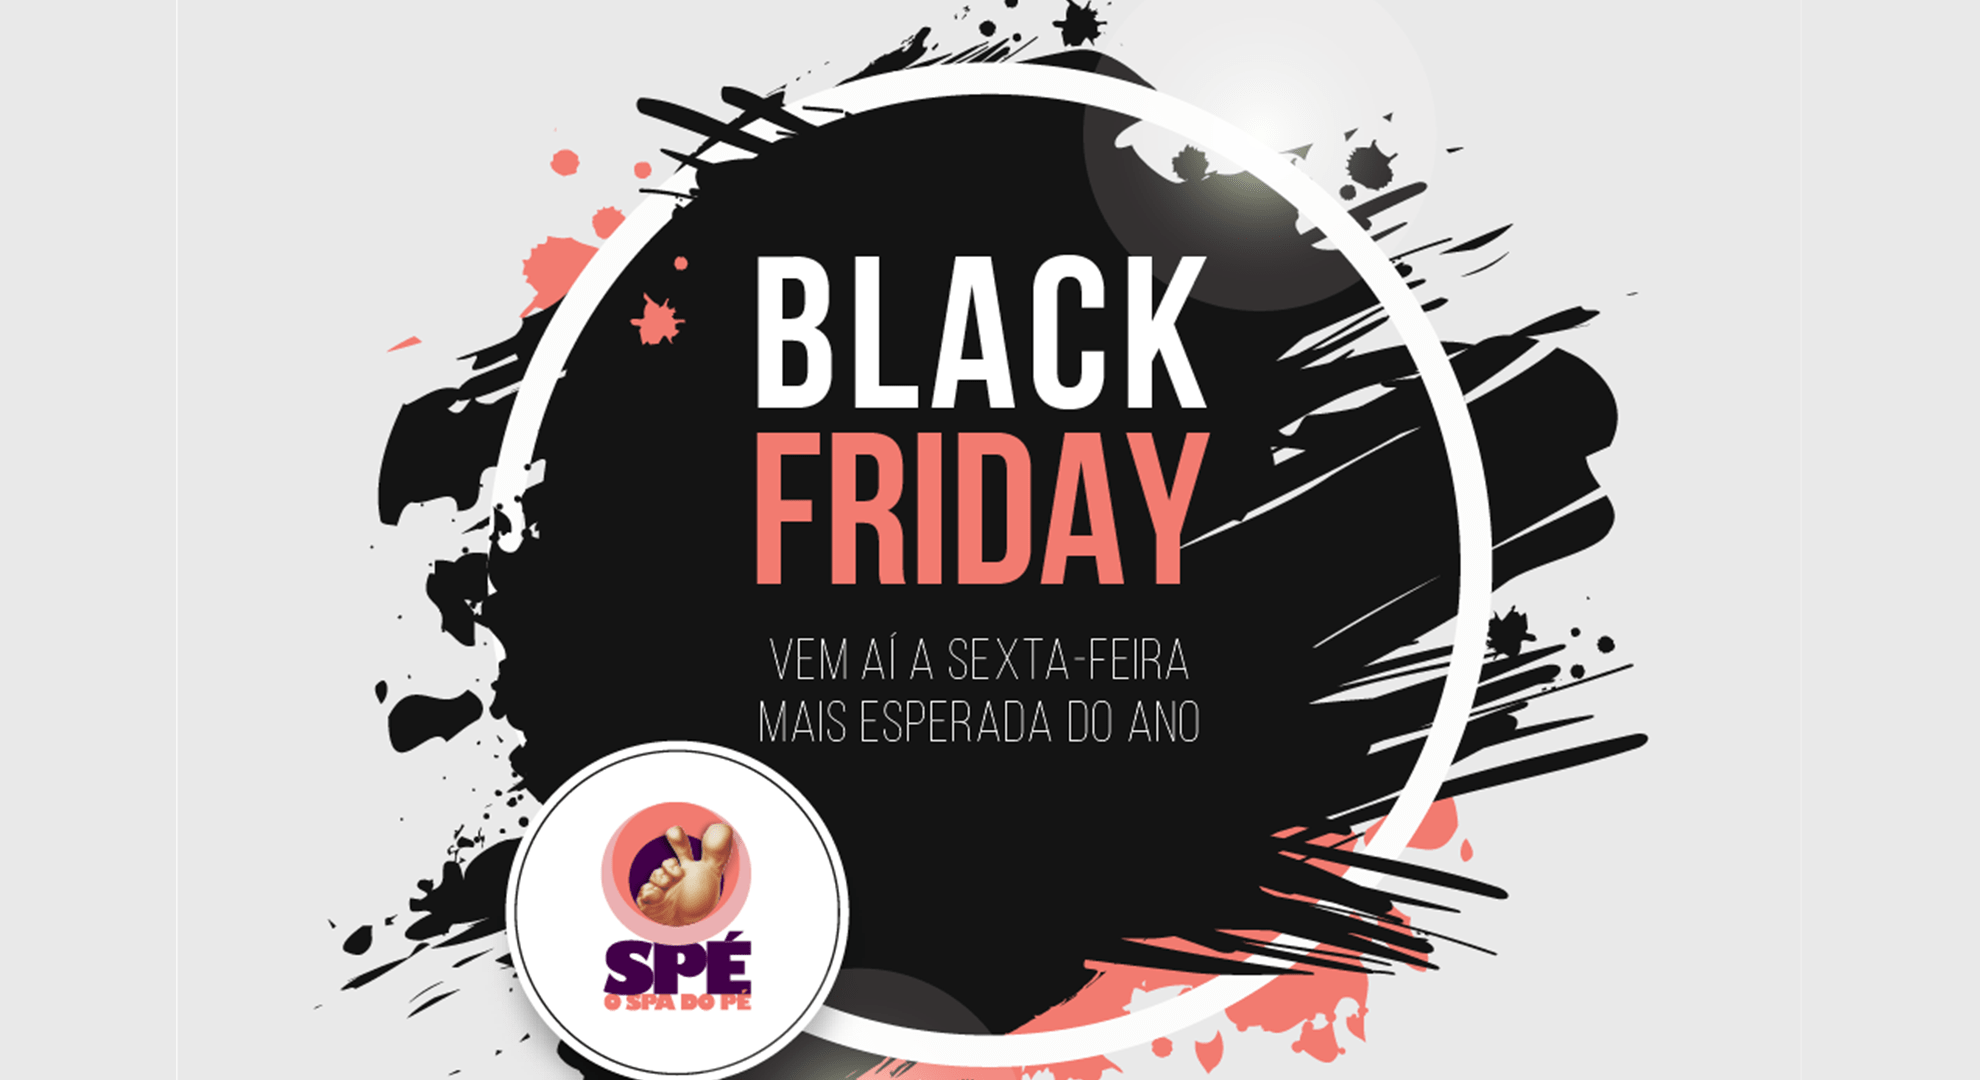 Teaser, Black Friday, SPÉ black Friday